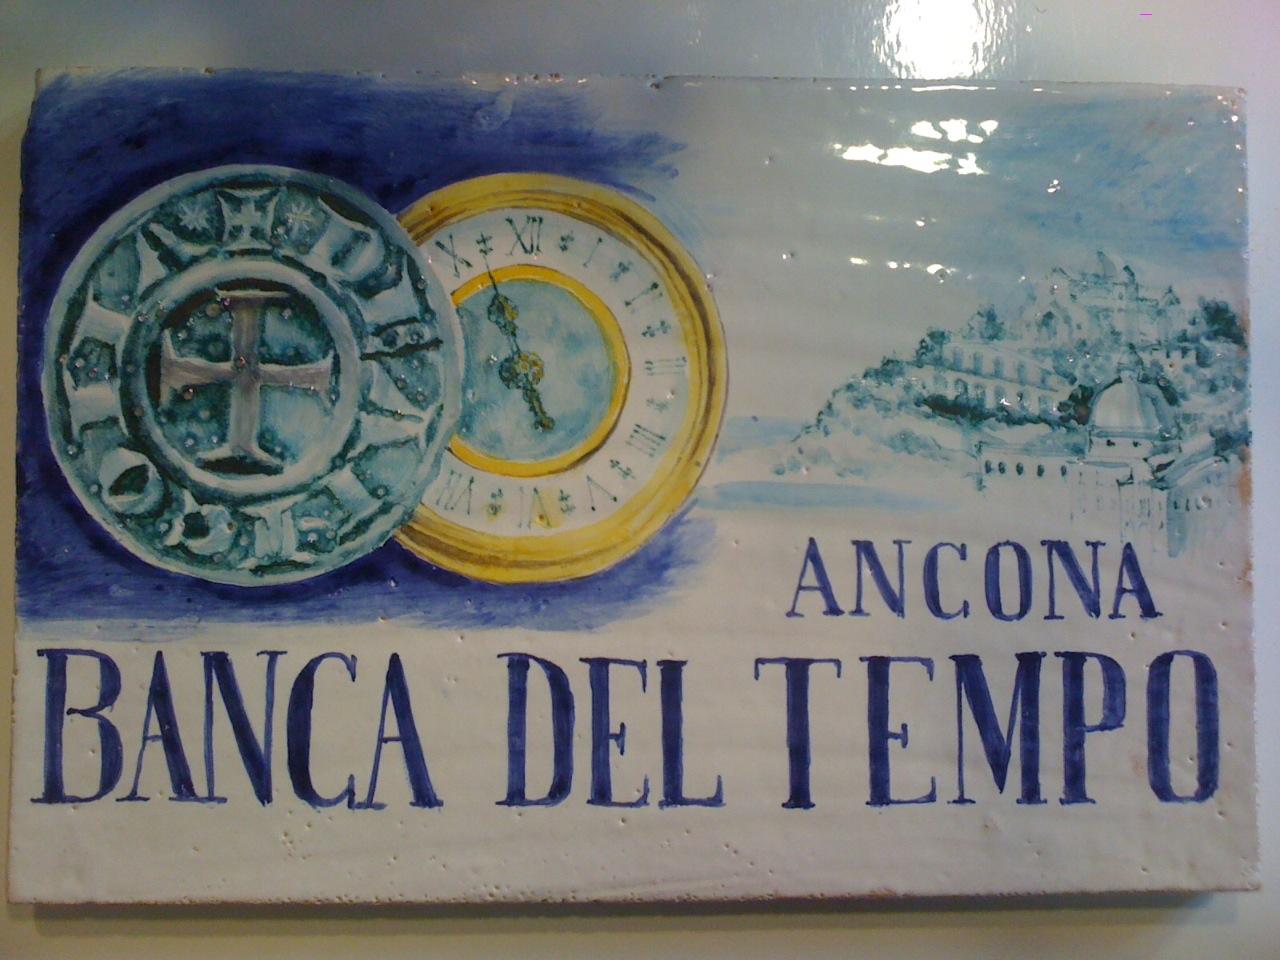 http://bancadeltempoancona.wordpress.com/link/